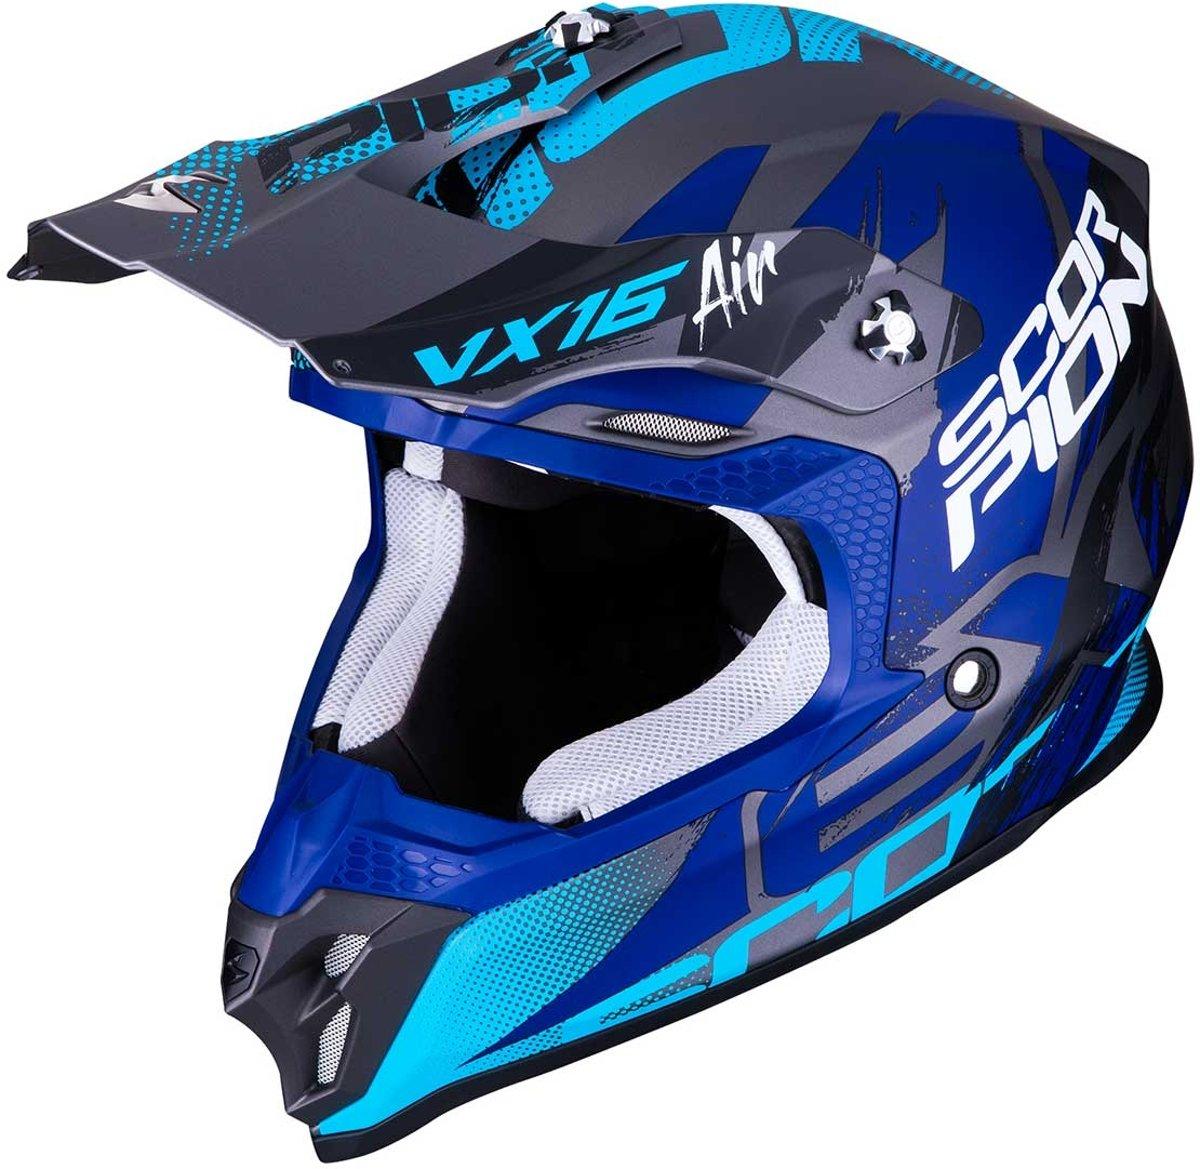 Scorpion Crosshelm VX-16 Albion Matt Silver/Blue-M